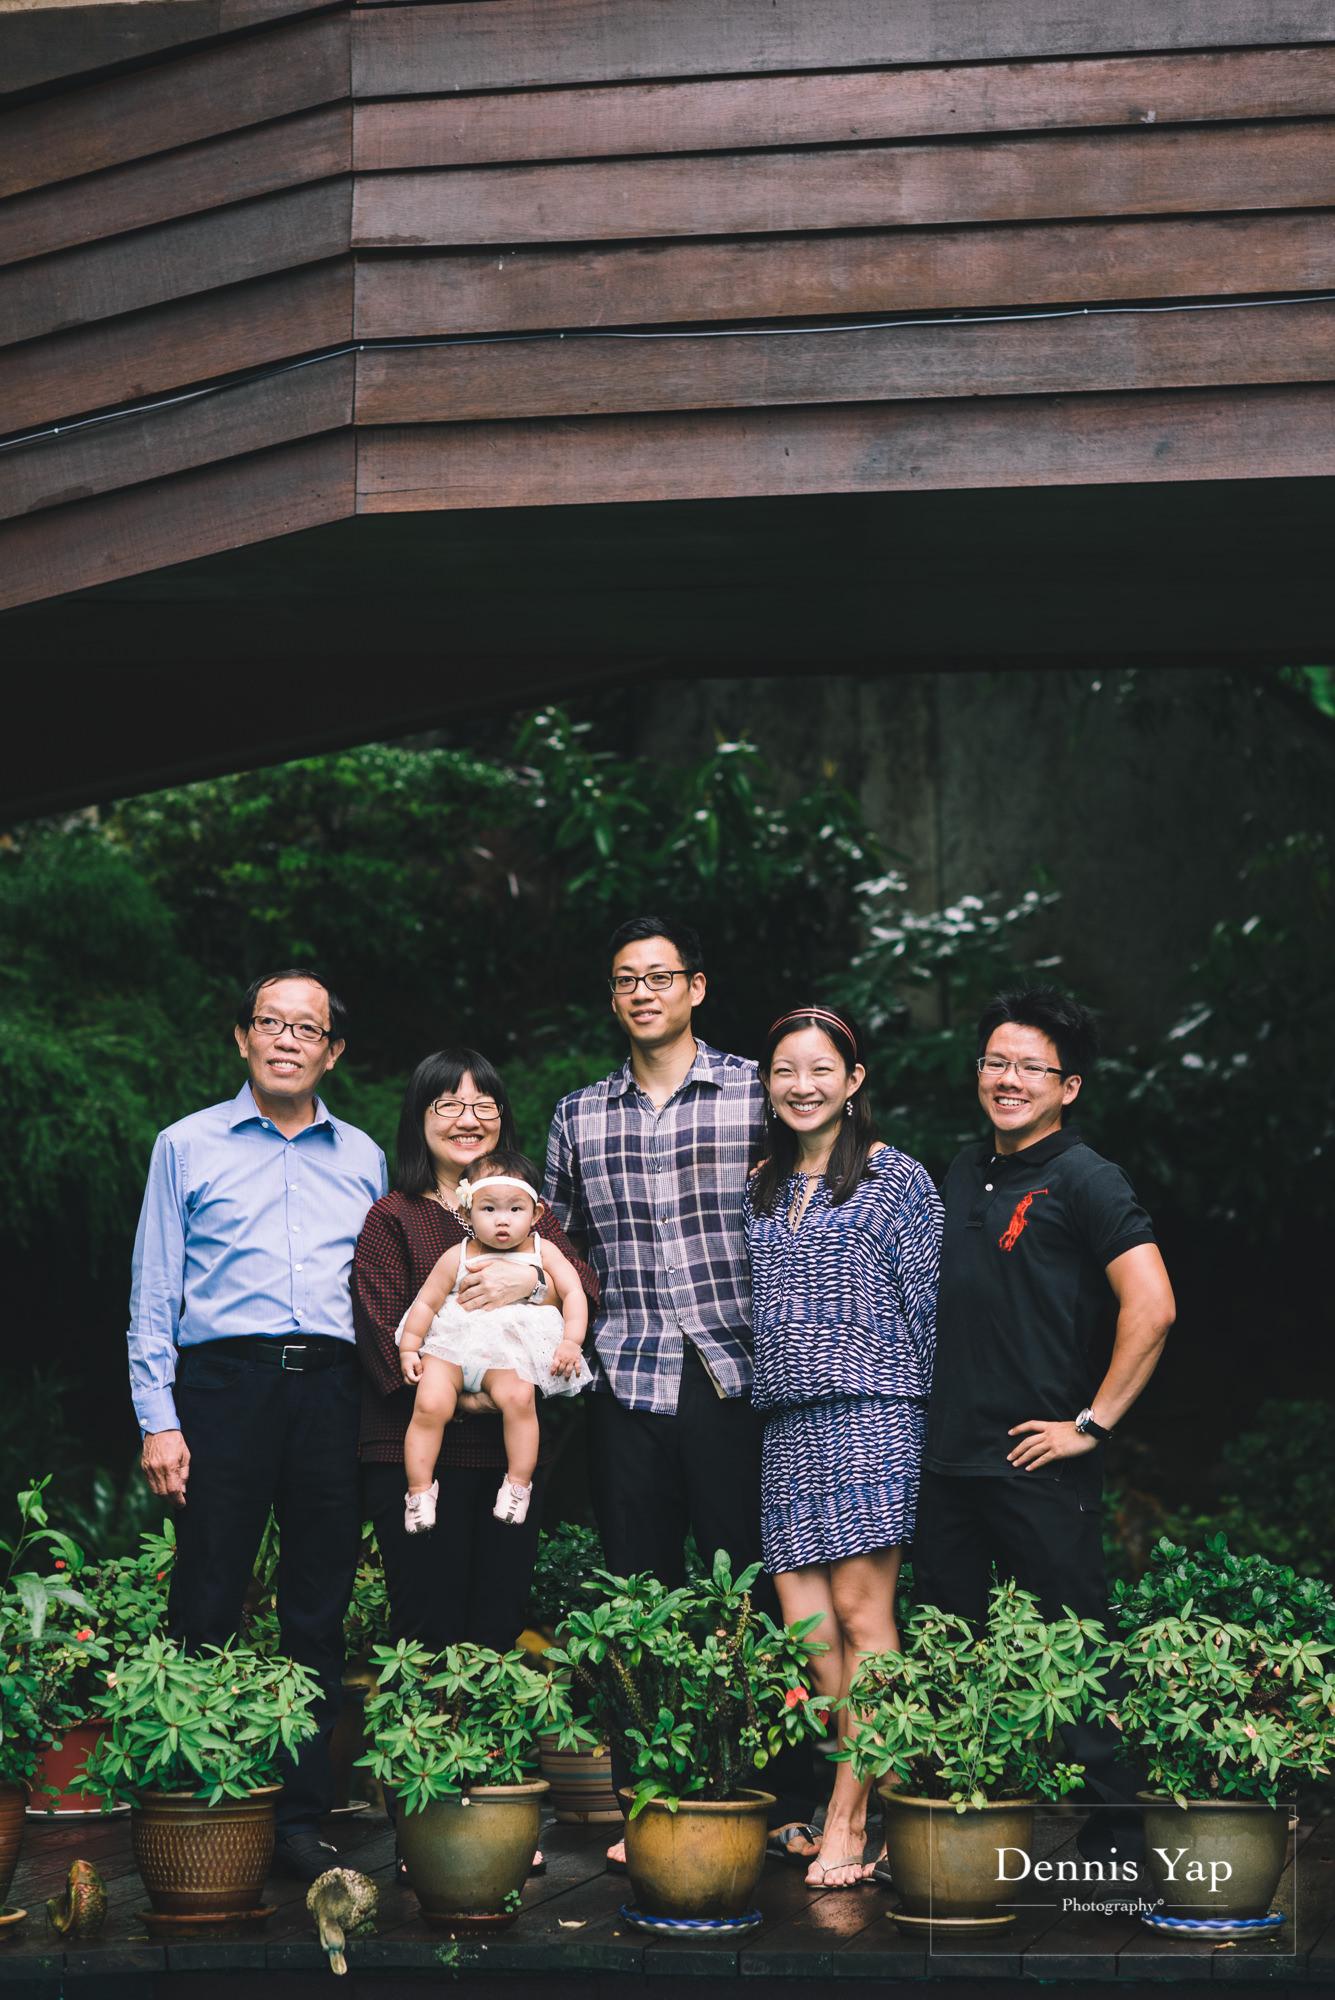 thong family chuen thong portrait beloved dennis yap photography-4.jpg